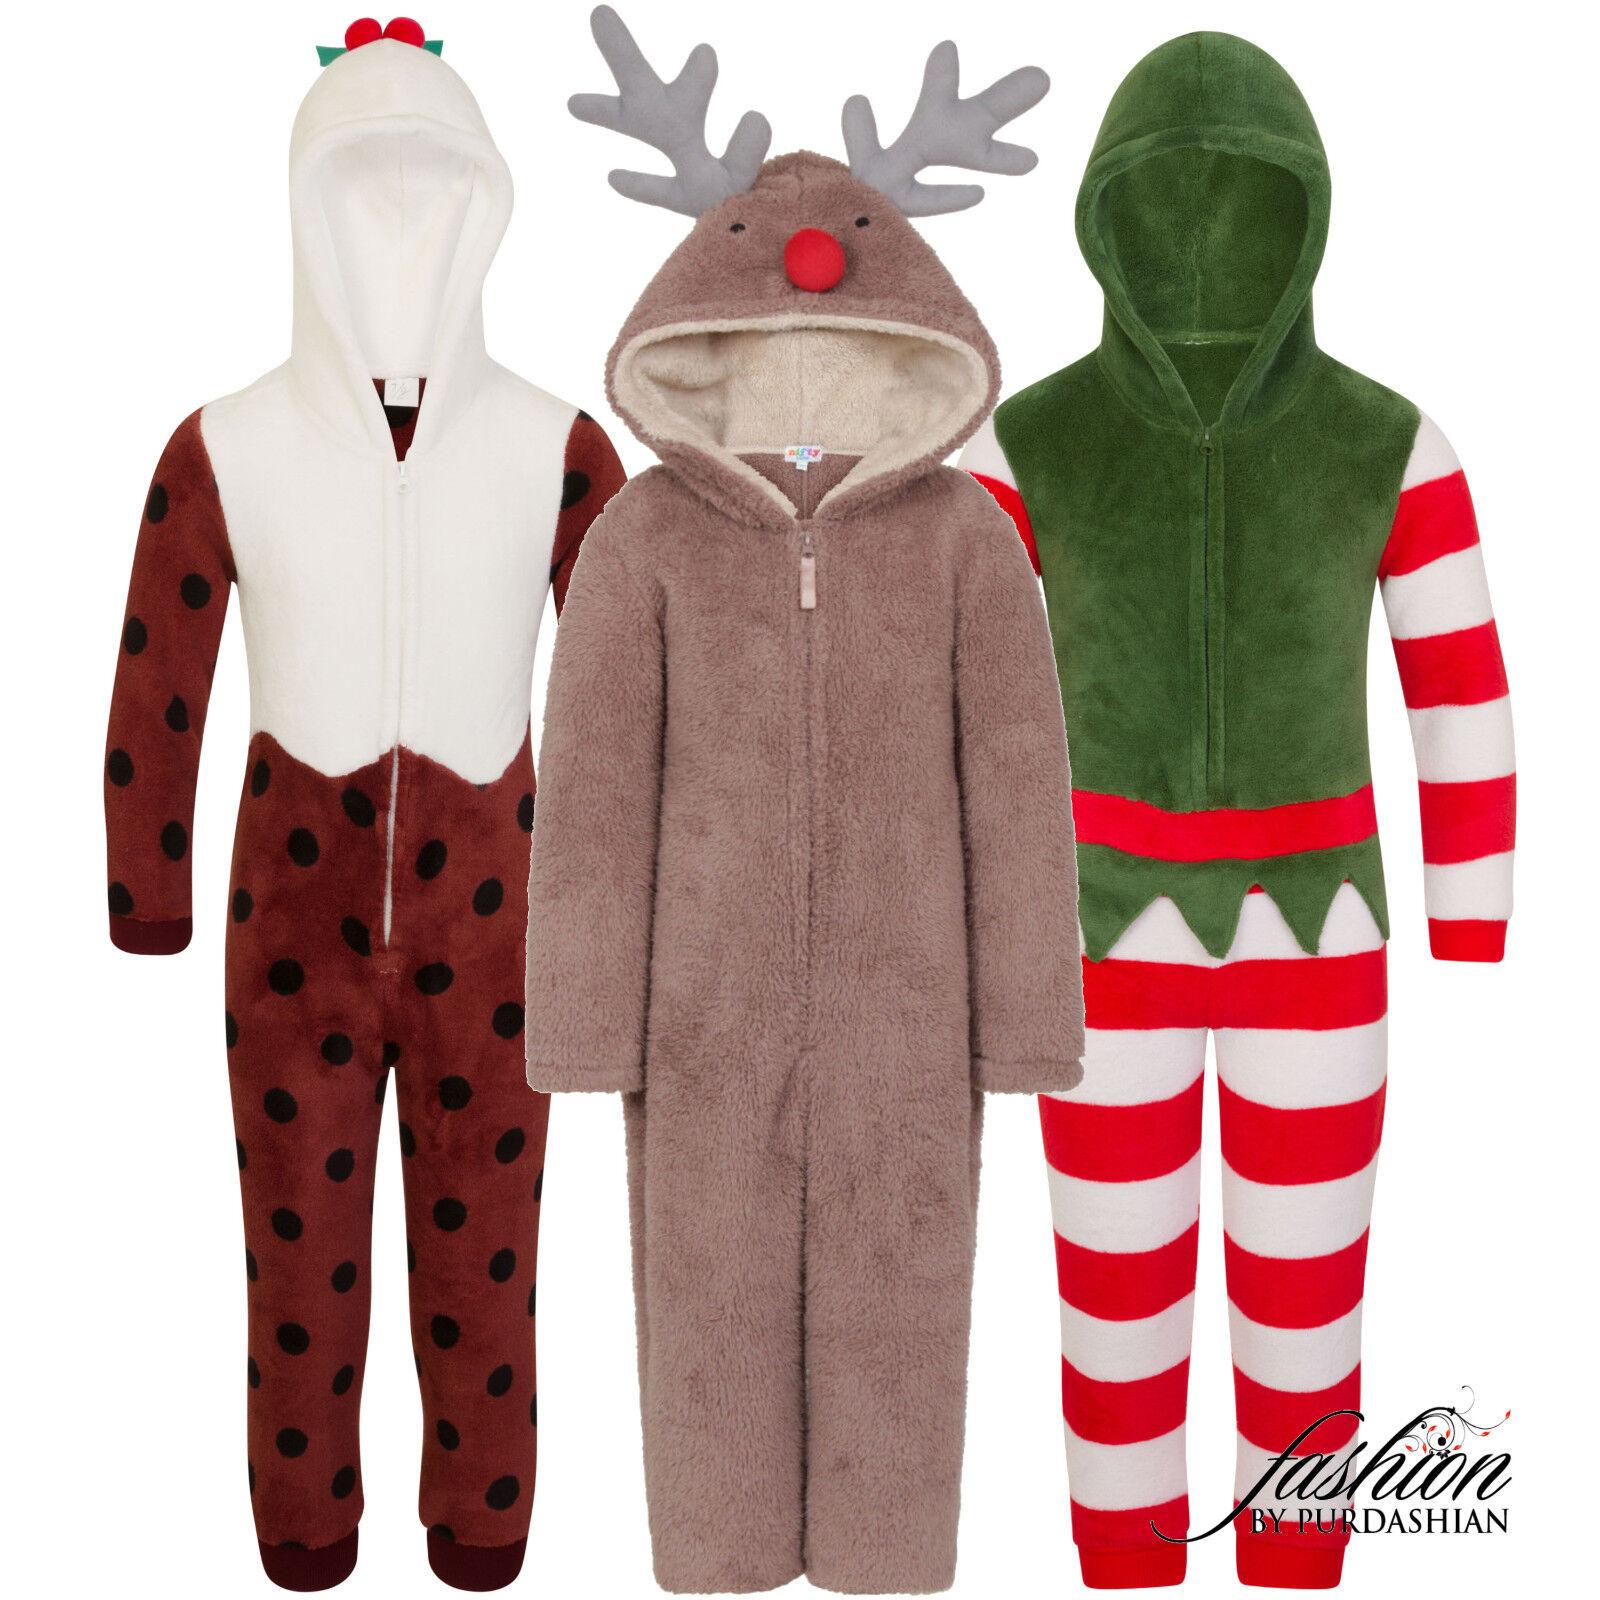 Details about Christmas 1Onesie Girls Boys Novelty Fleece Santa Fancy Dress  Costume Nativity 6aa560f9d